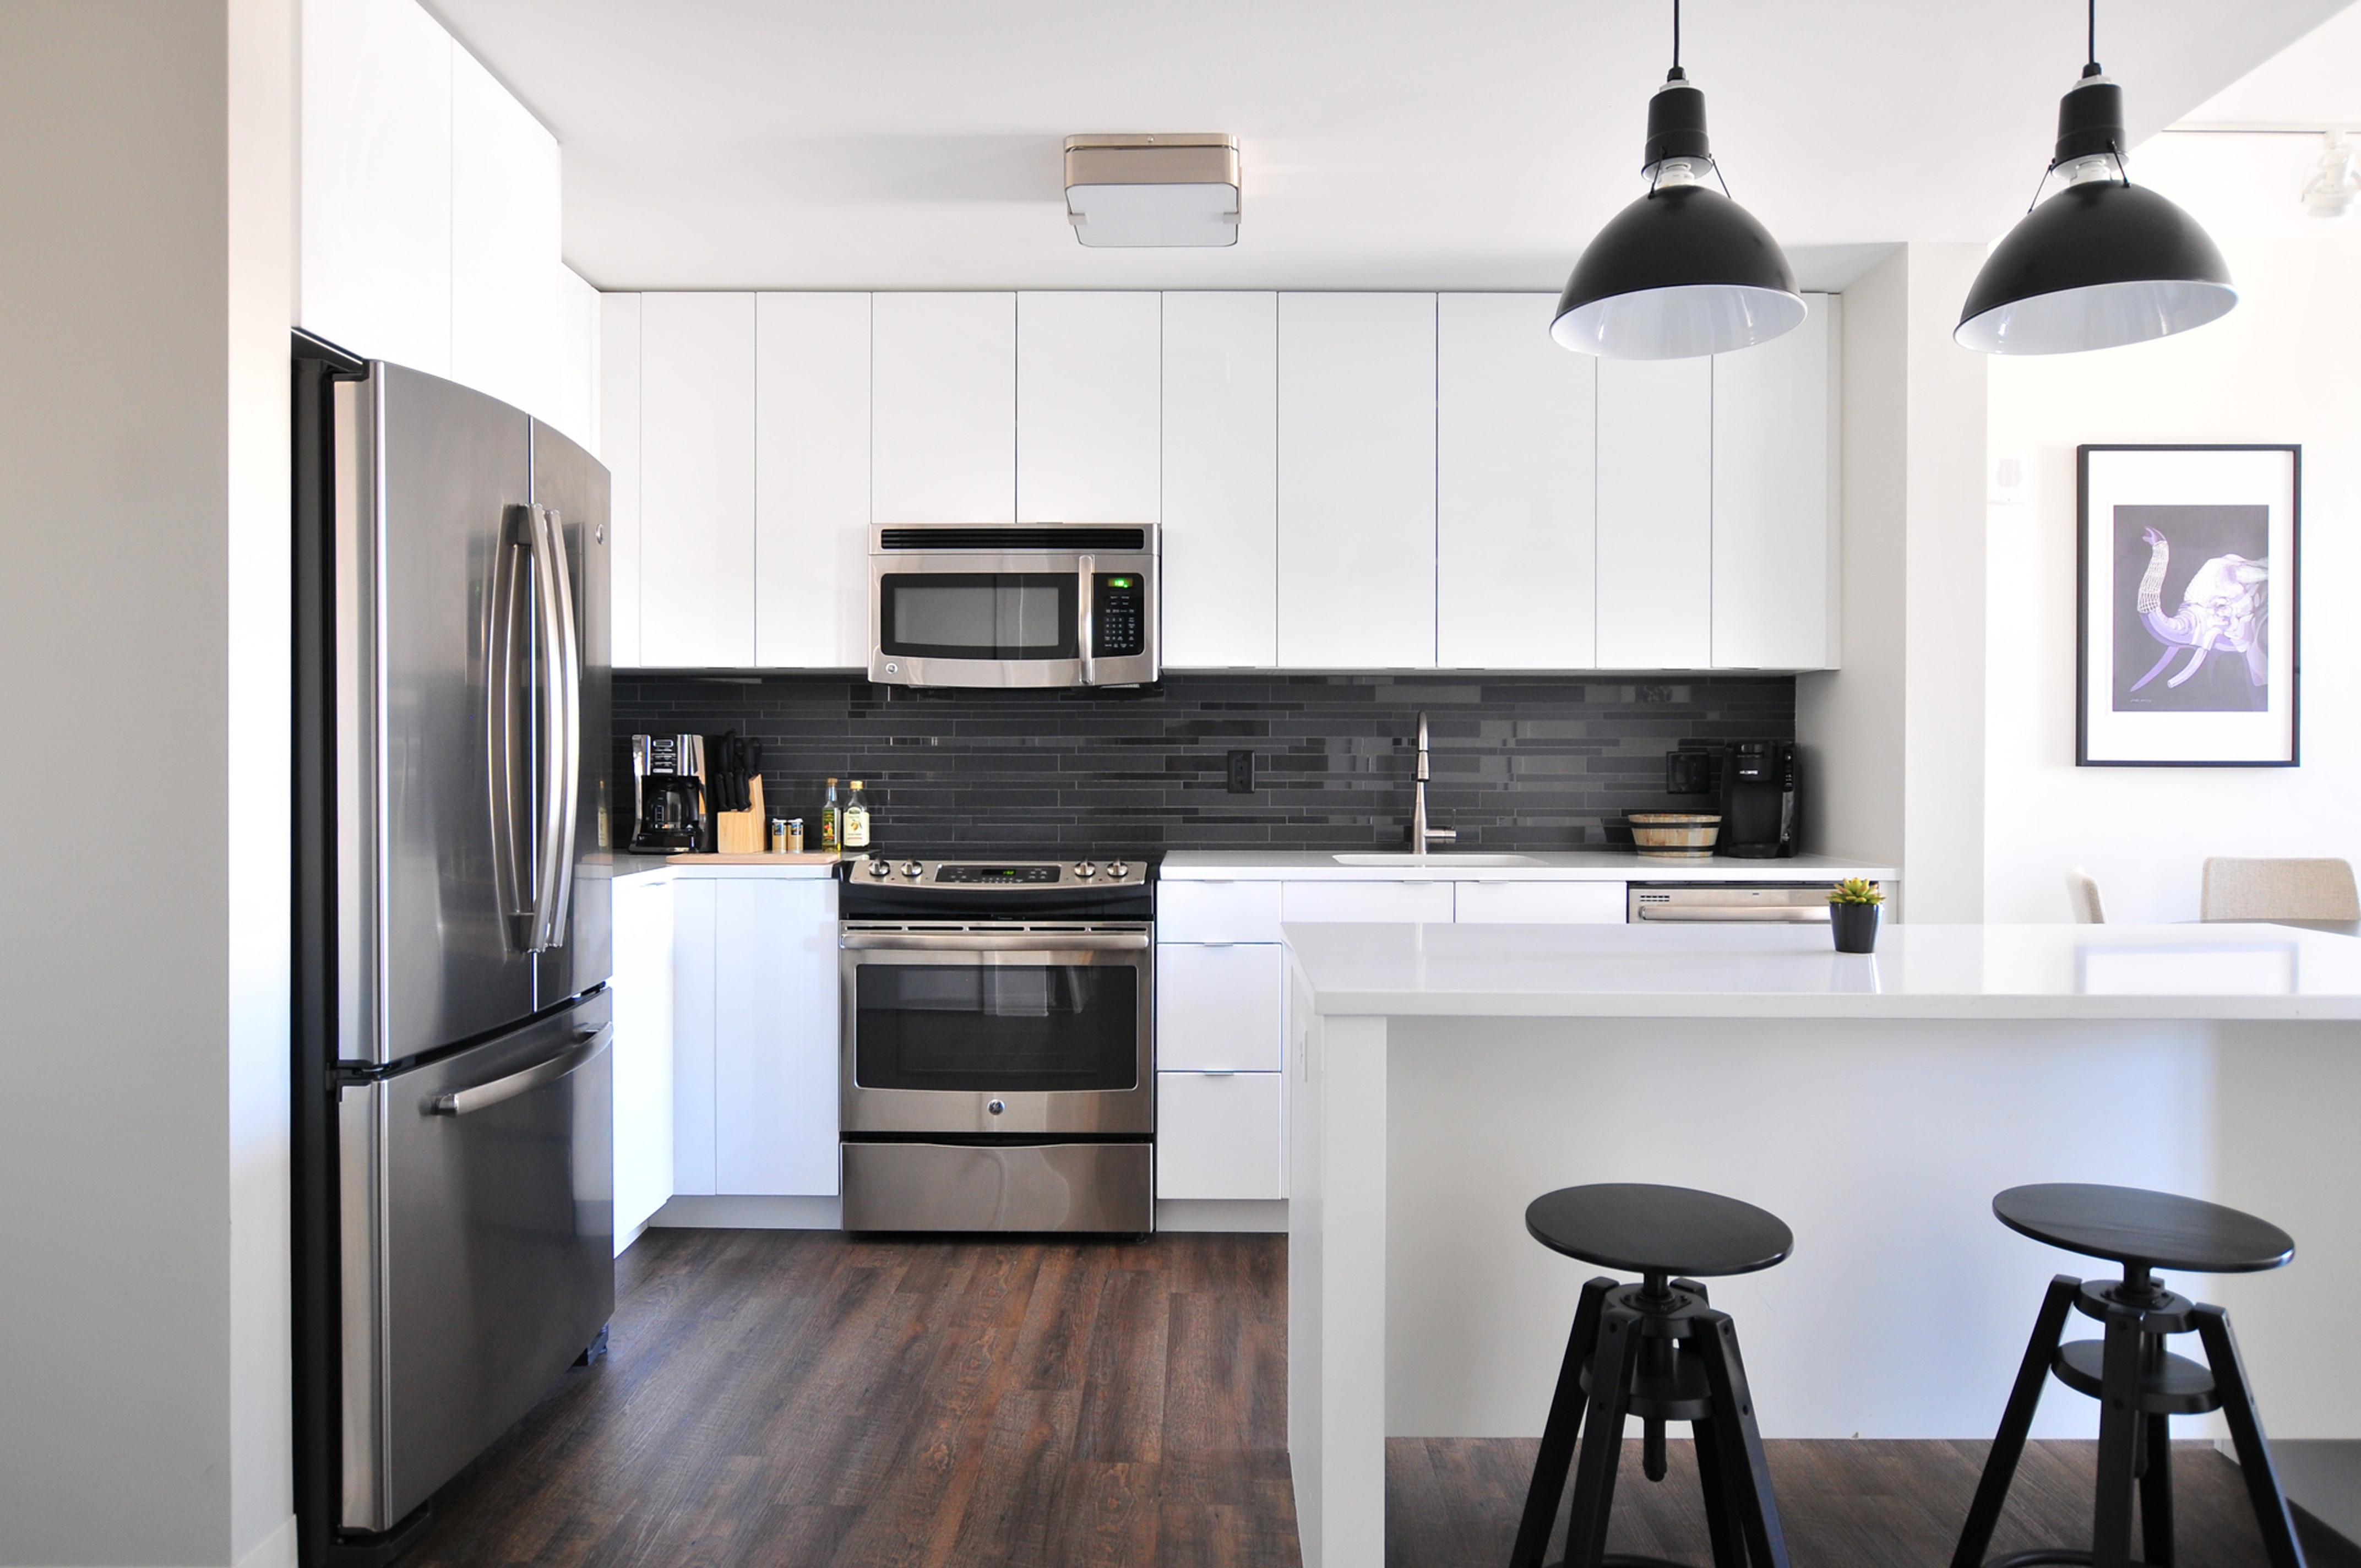 Residential ApplianceDiagnostic